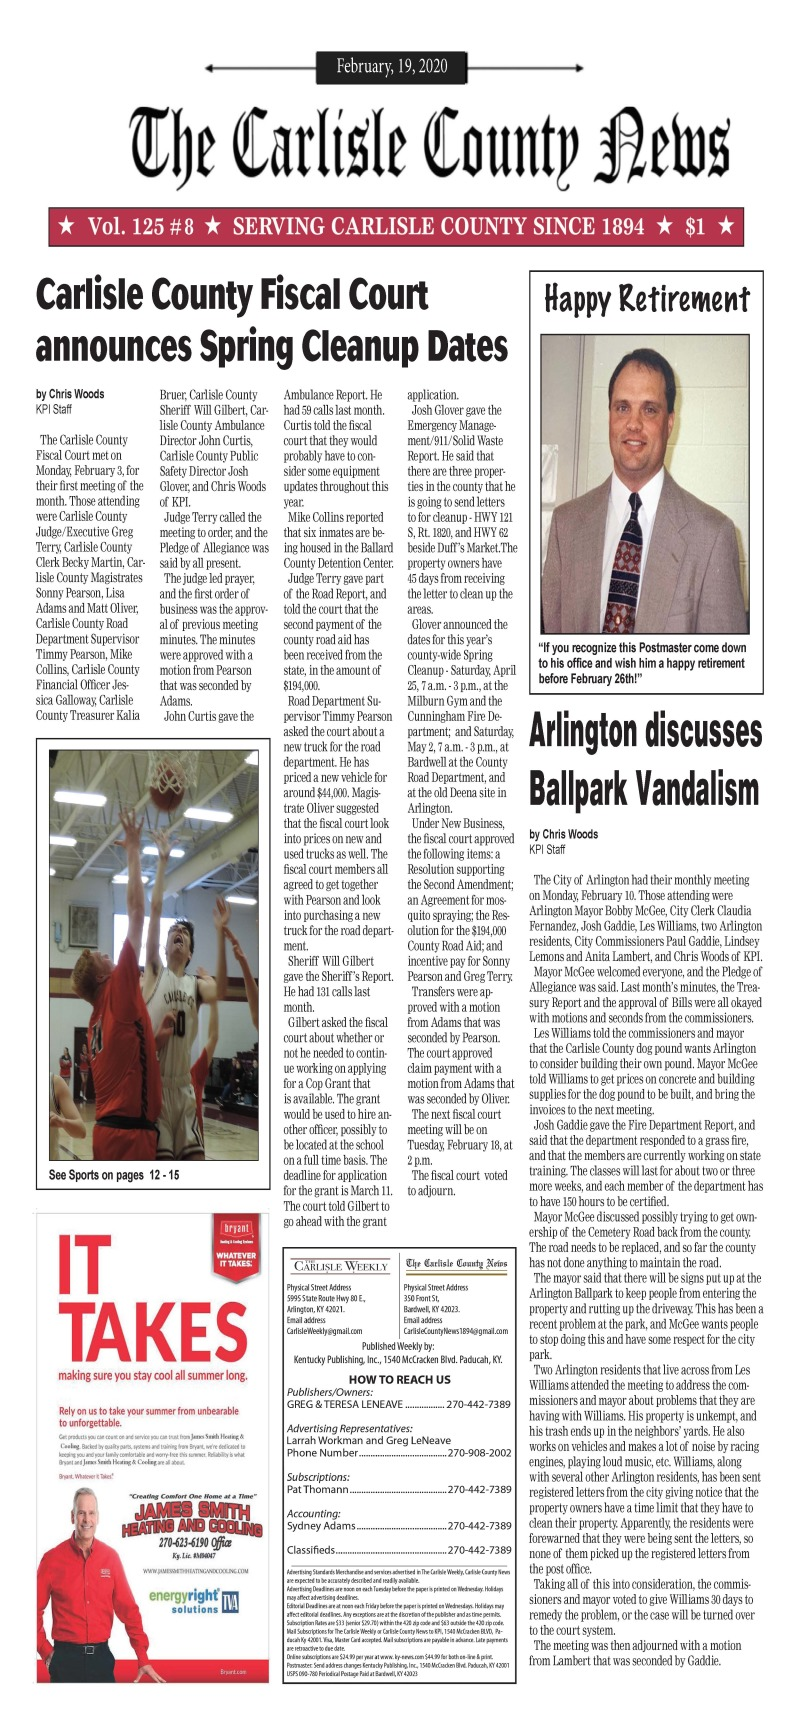 Carlisle County News 2-18-20